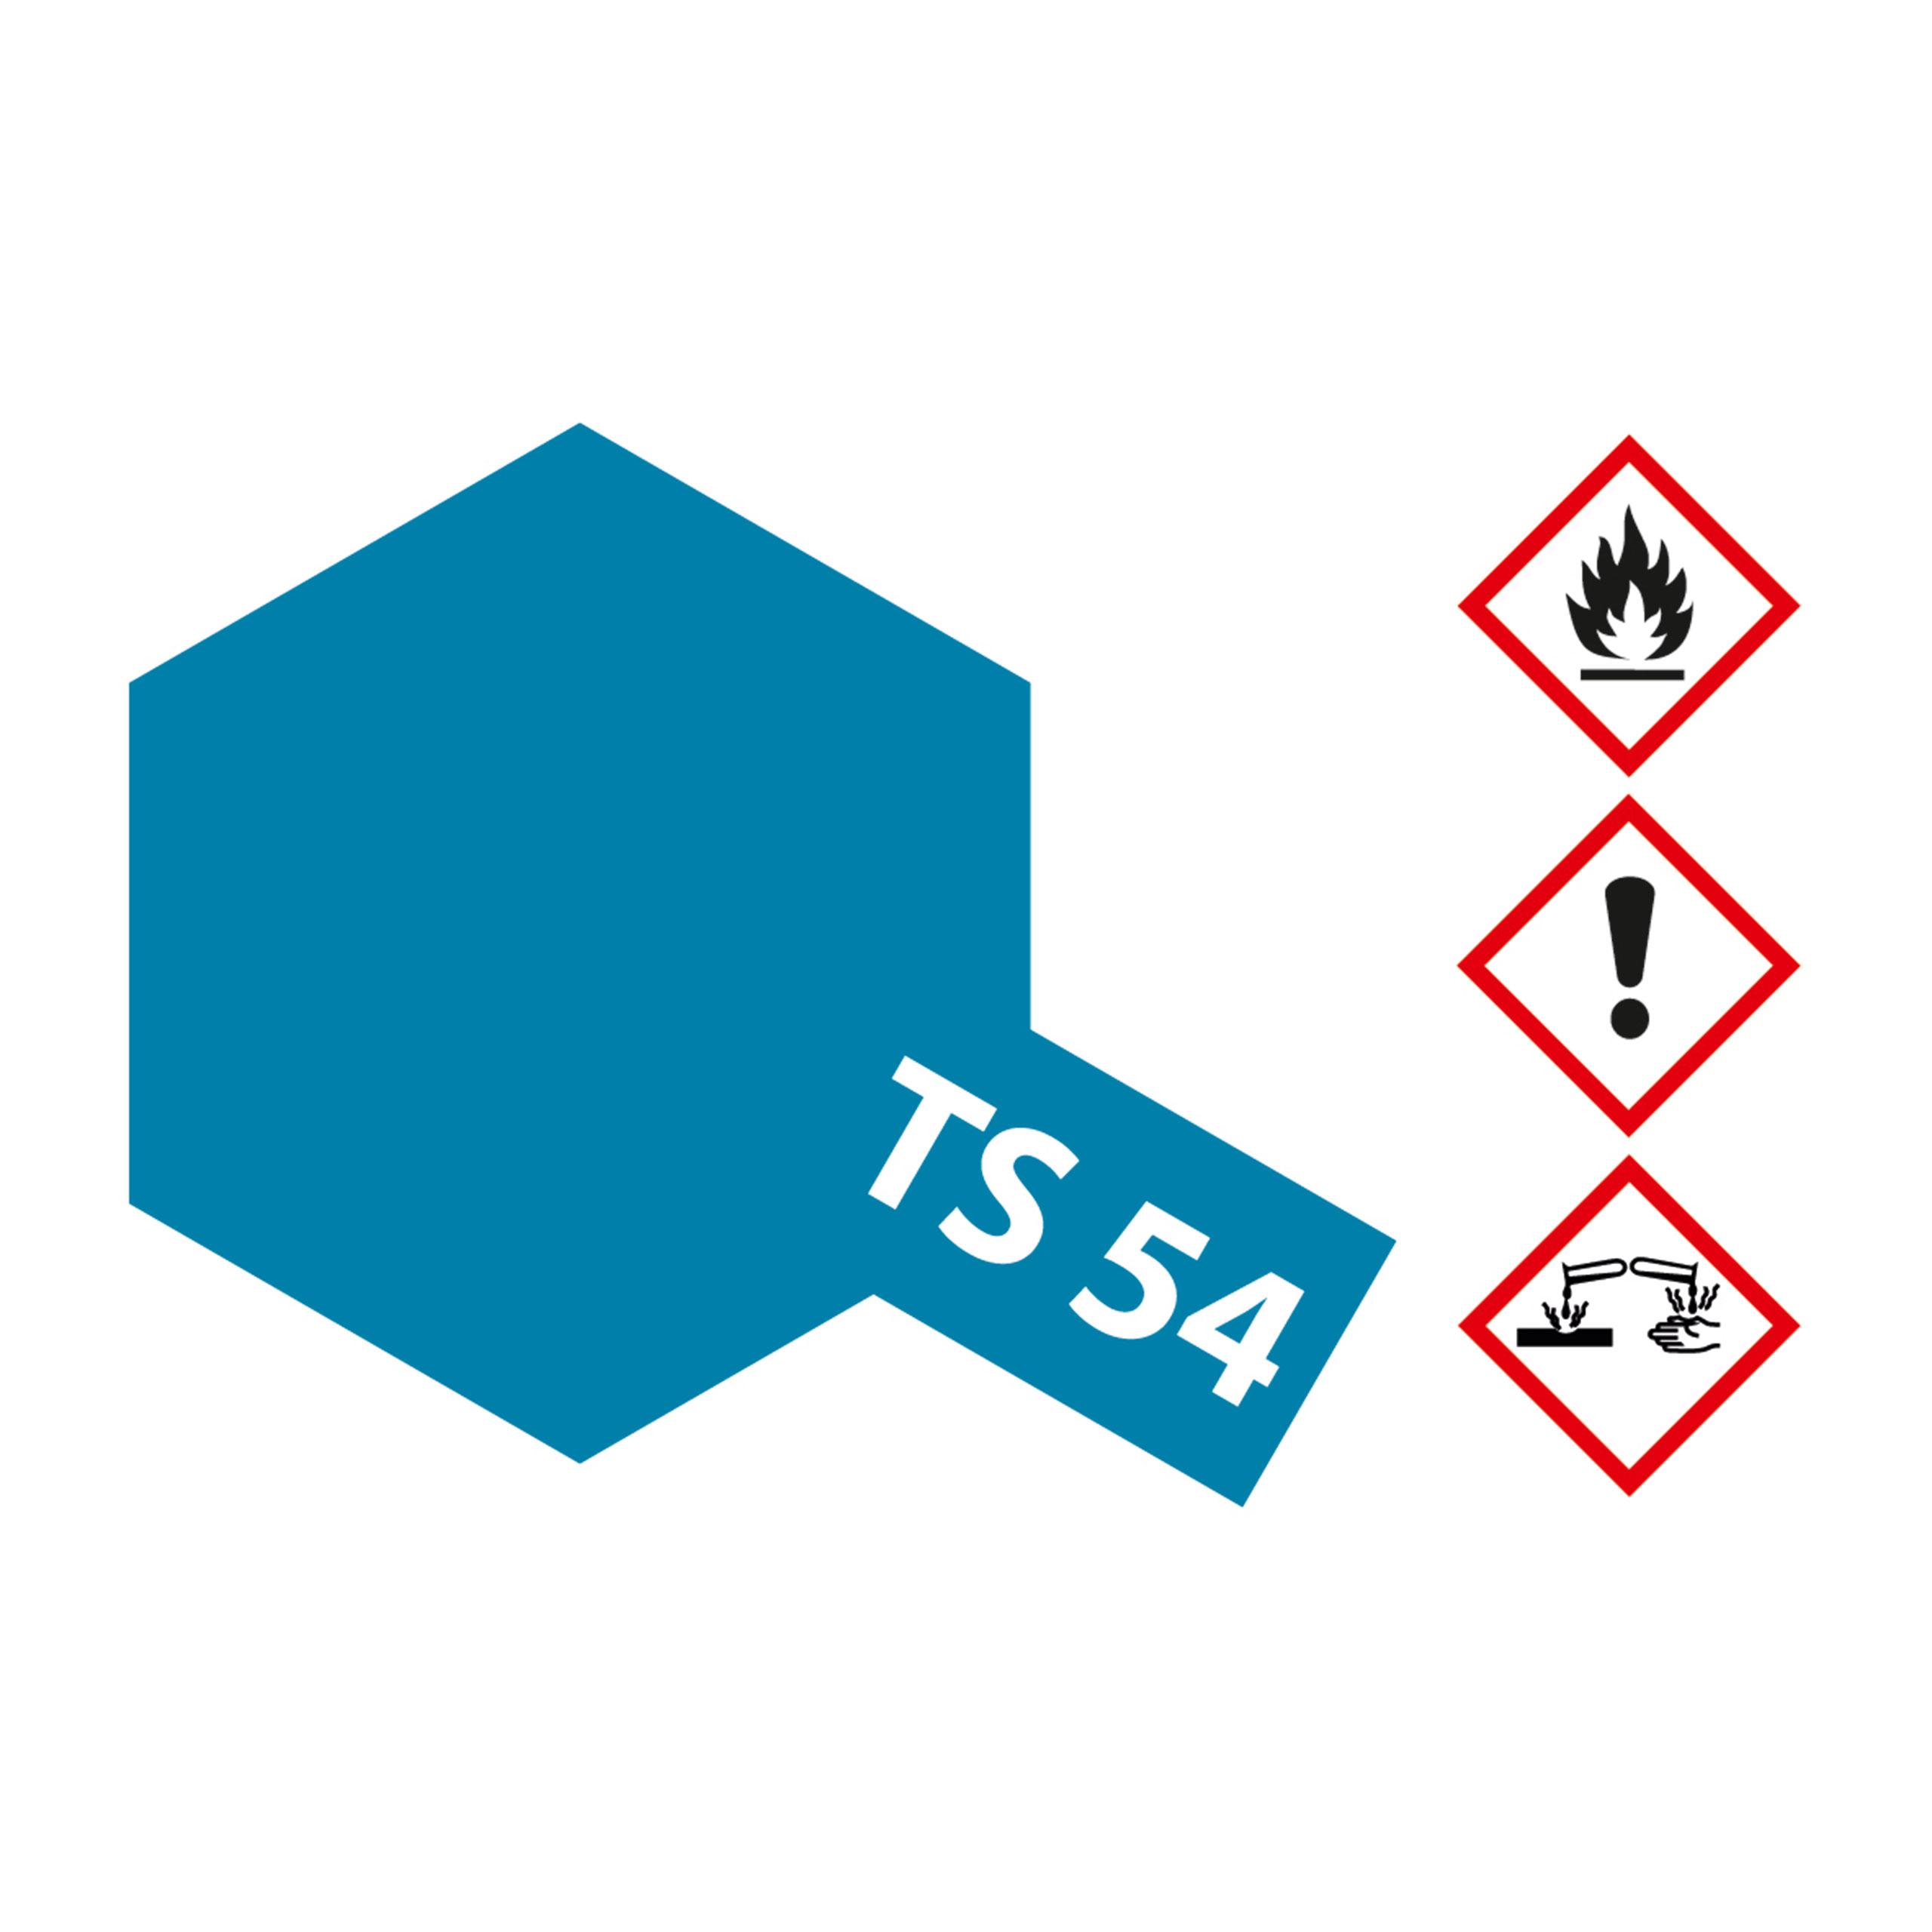 TS-54 Metallic Blau Hell glaenzend - 100ml Sprayfarbe Kunstharz Tamiya 300085054